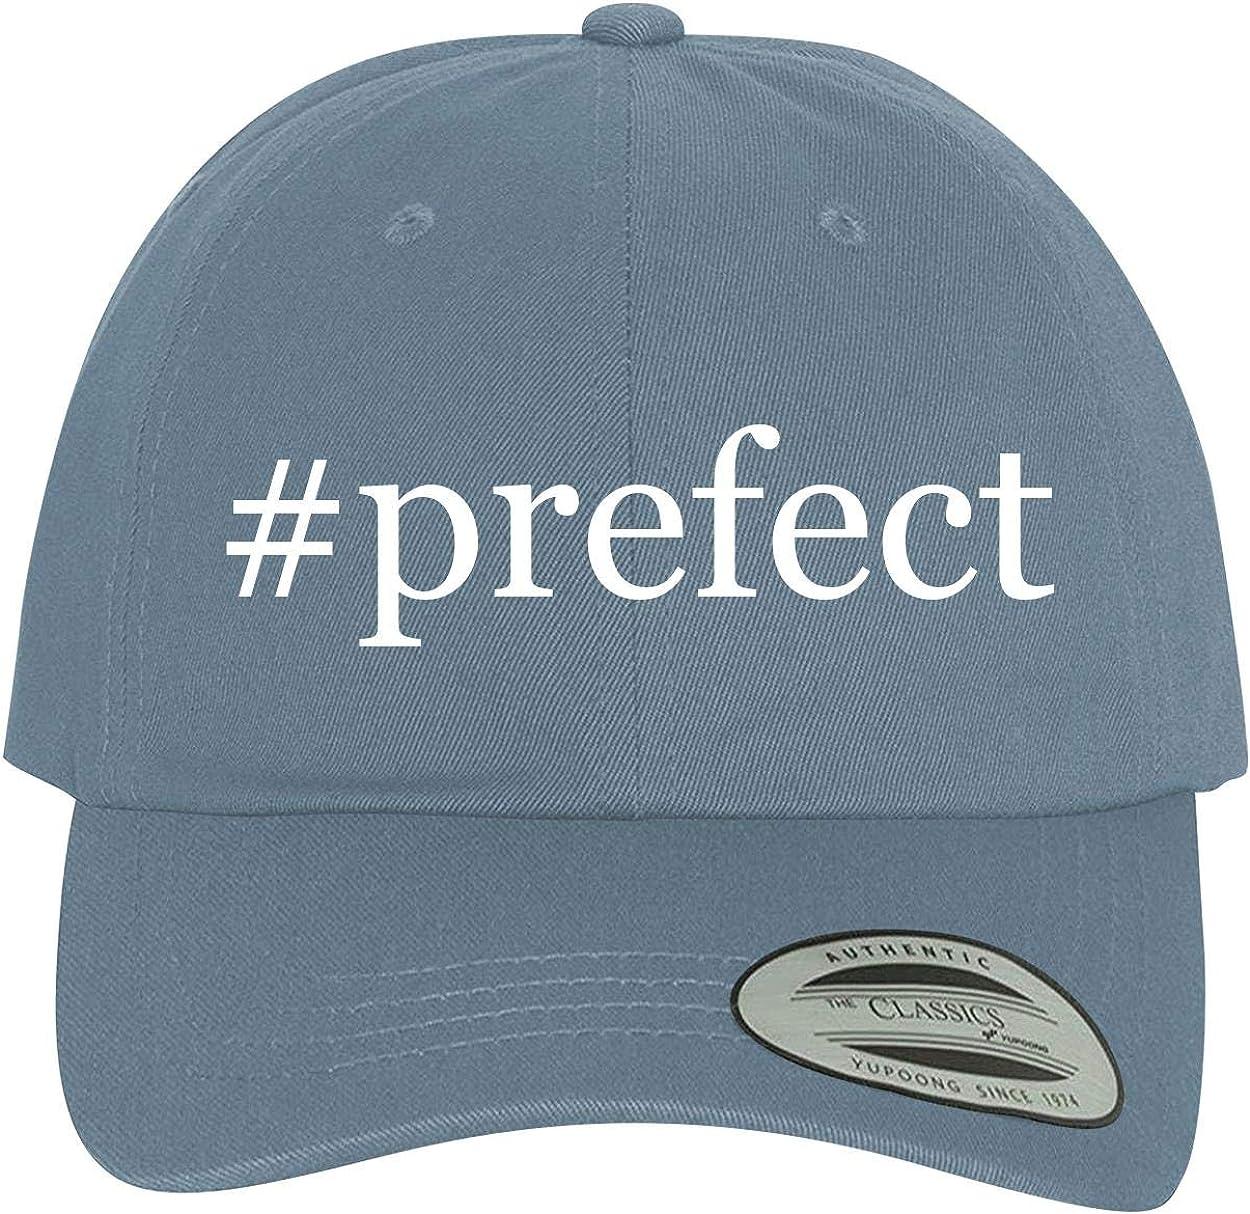 Comfortable Dad Hat Baseball Cap BH Cool Designs #Prefect